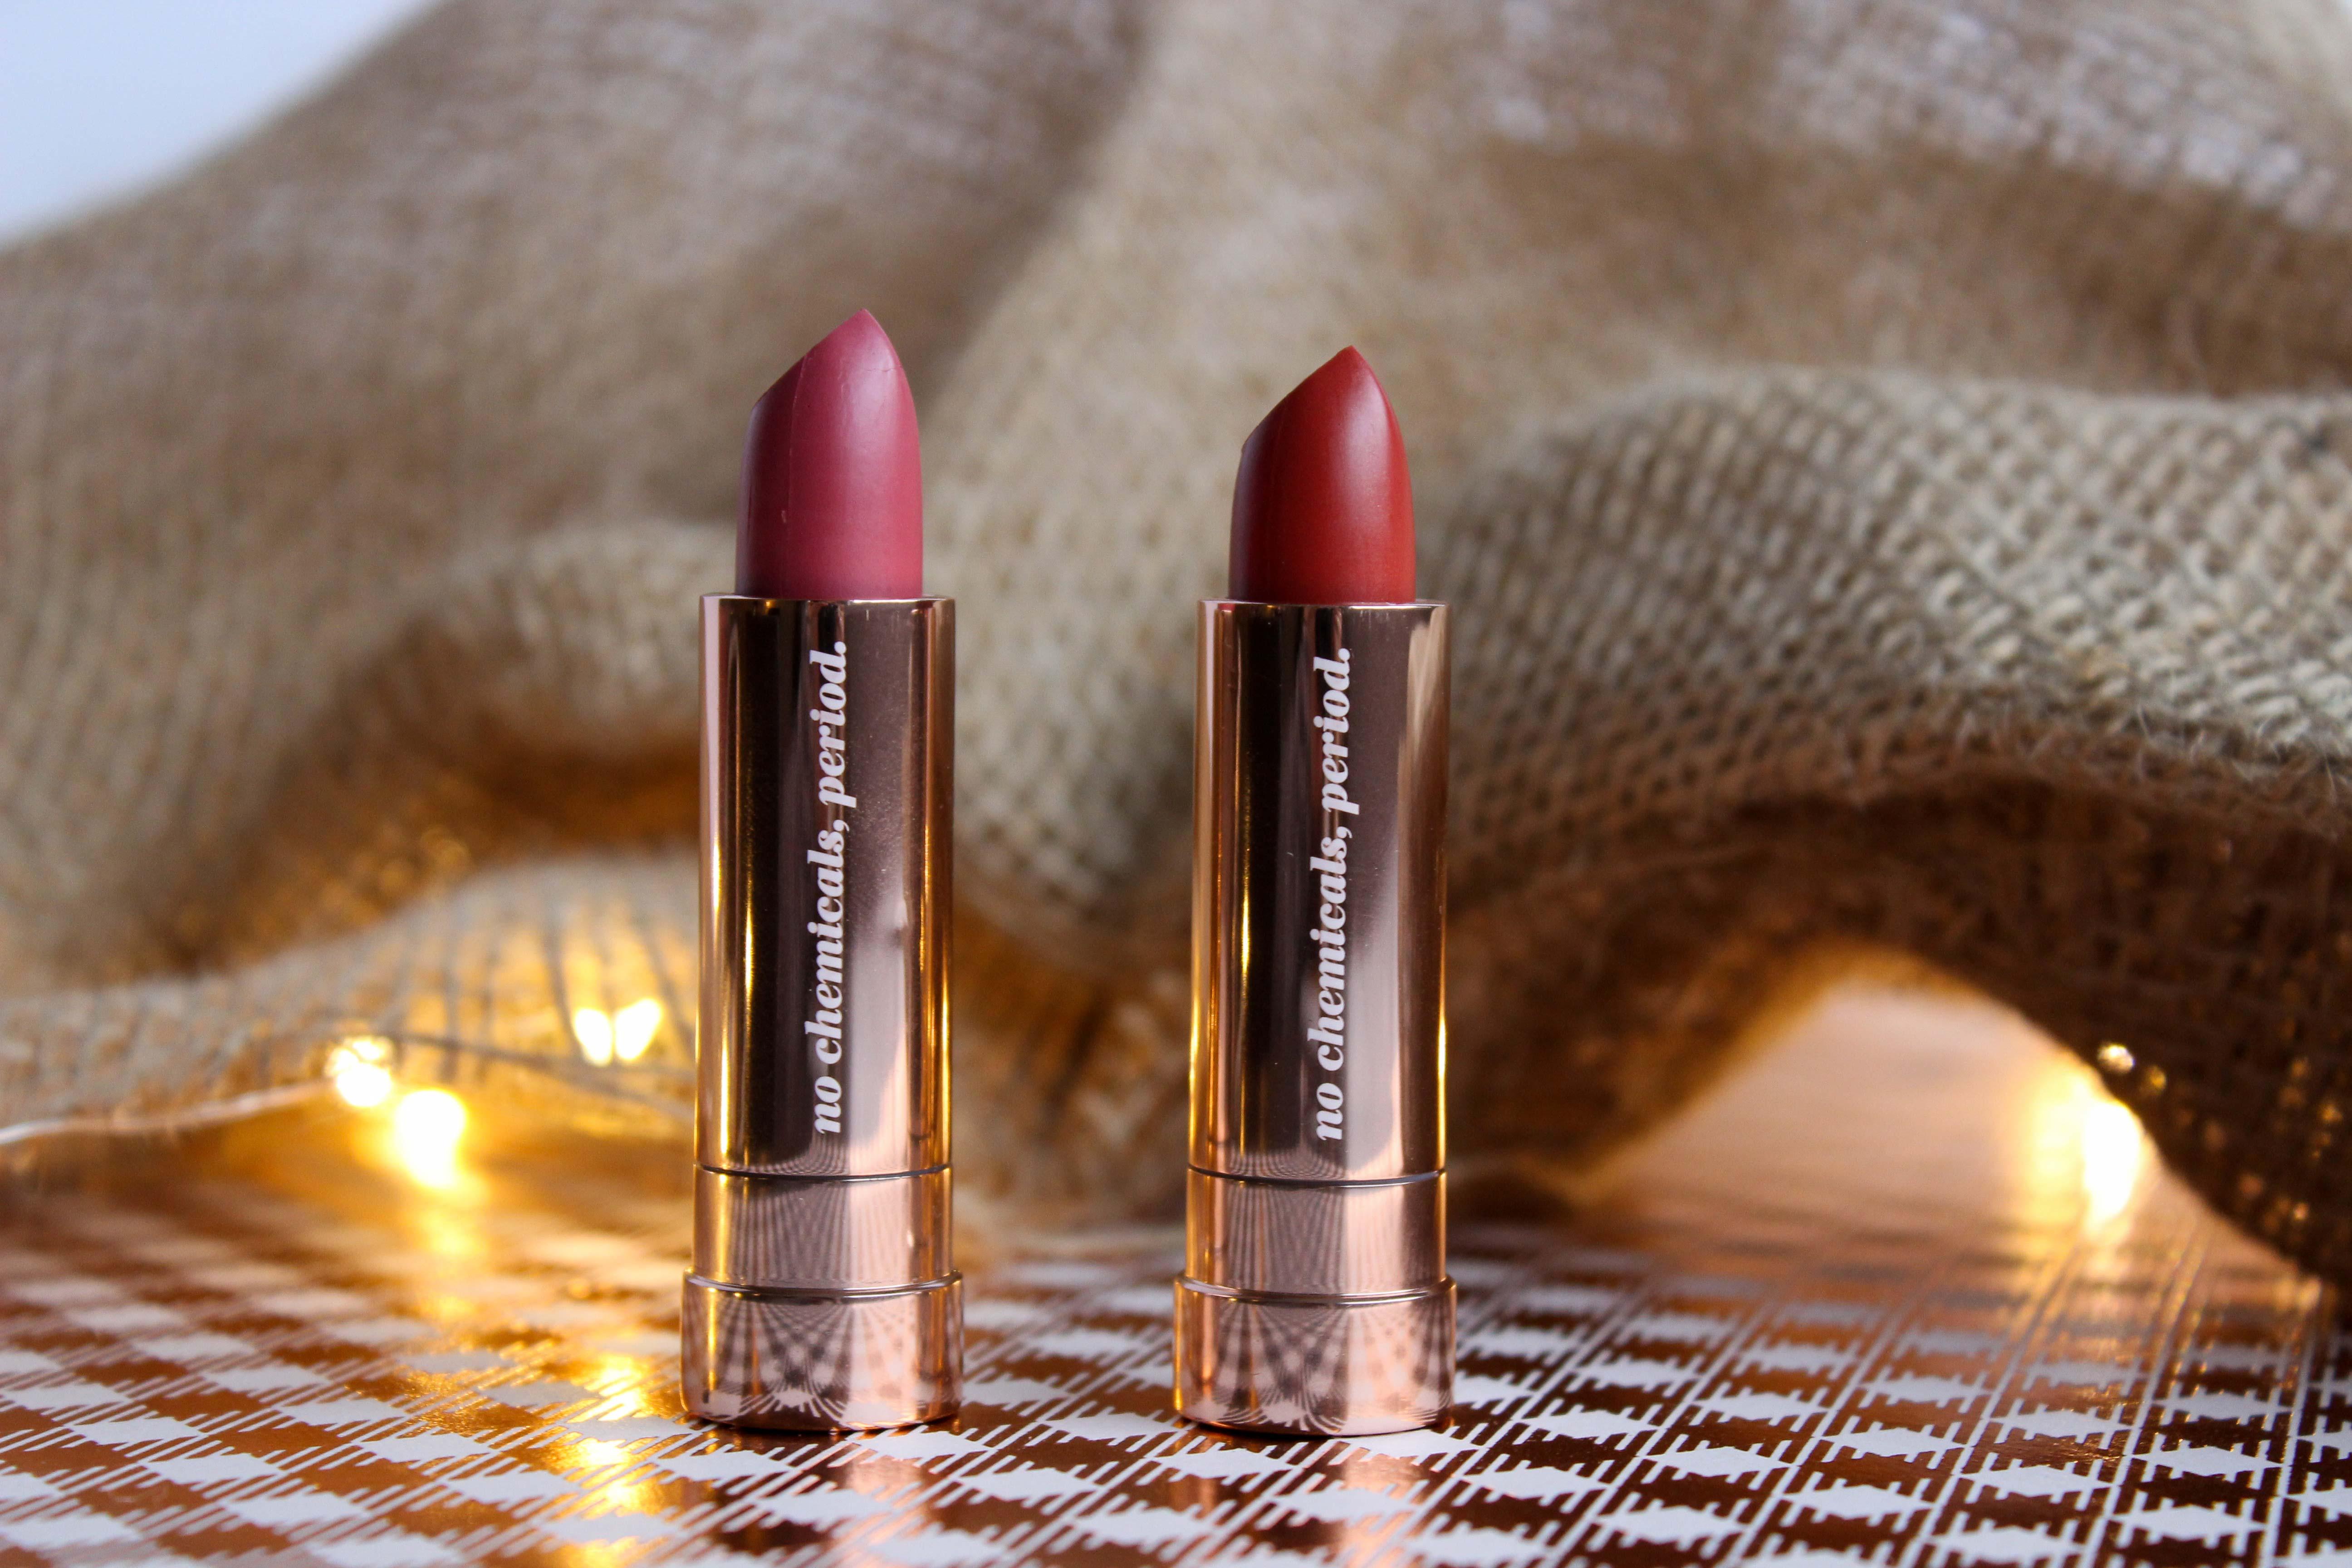 Boosh Natural Lipstick Review Title